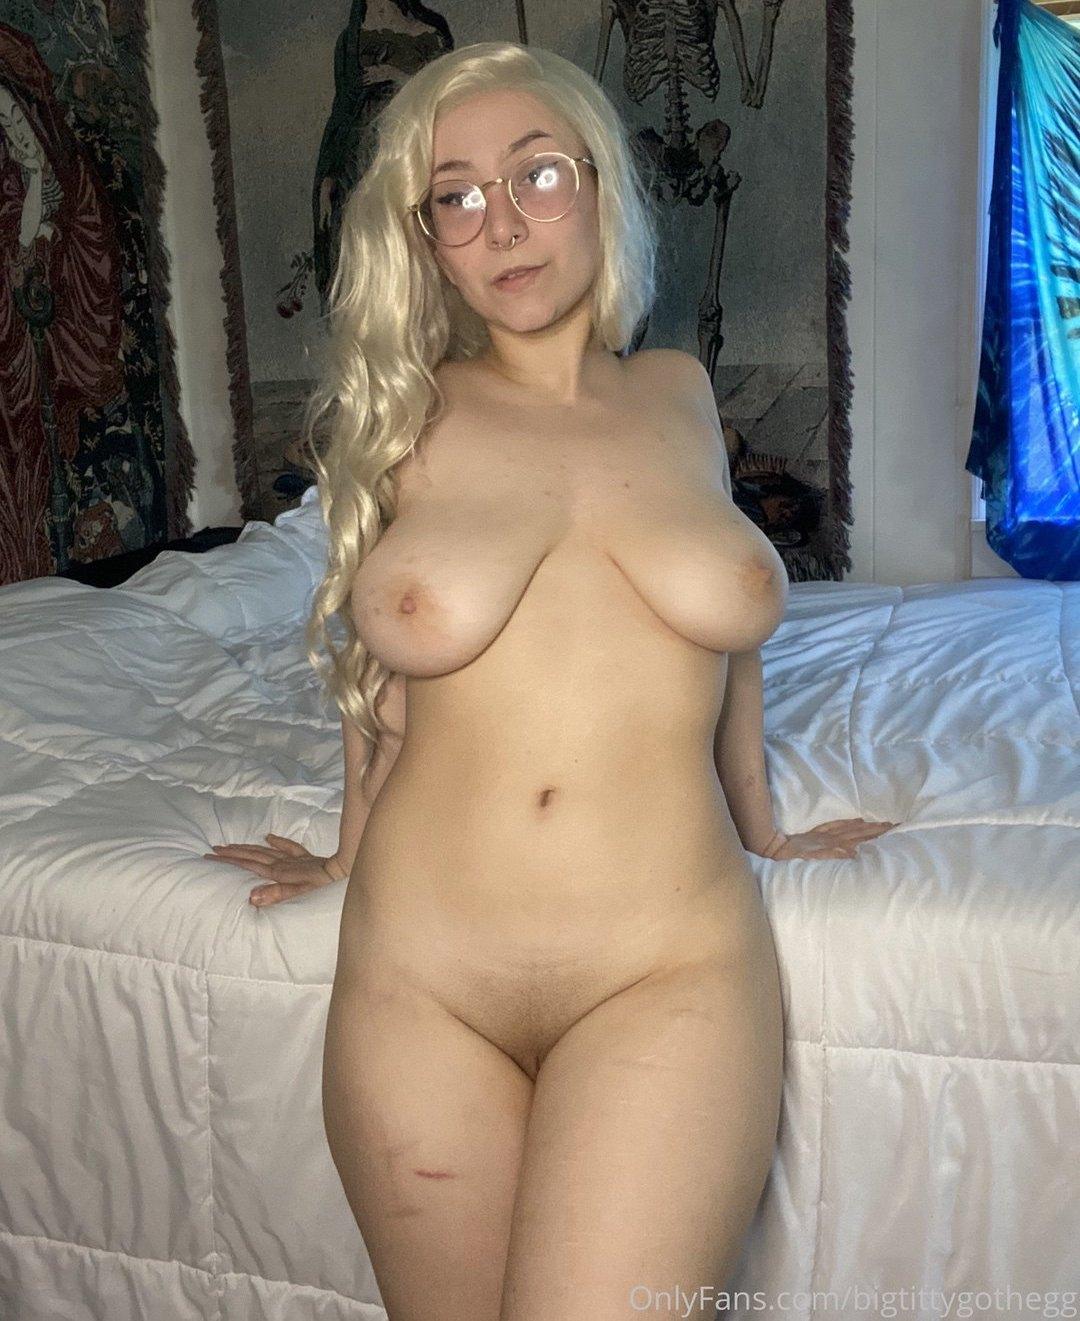 Lee Bigtittygothegg Onlyfans Nudes Leaks 0006